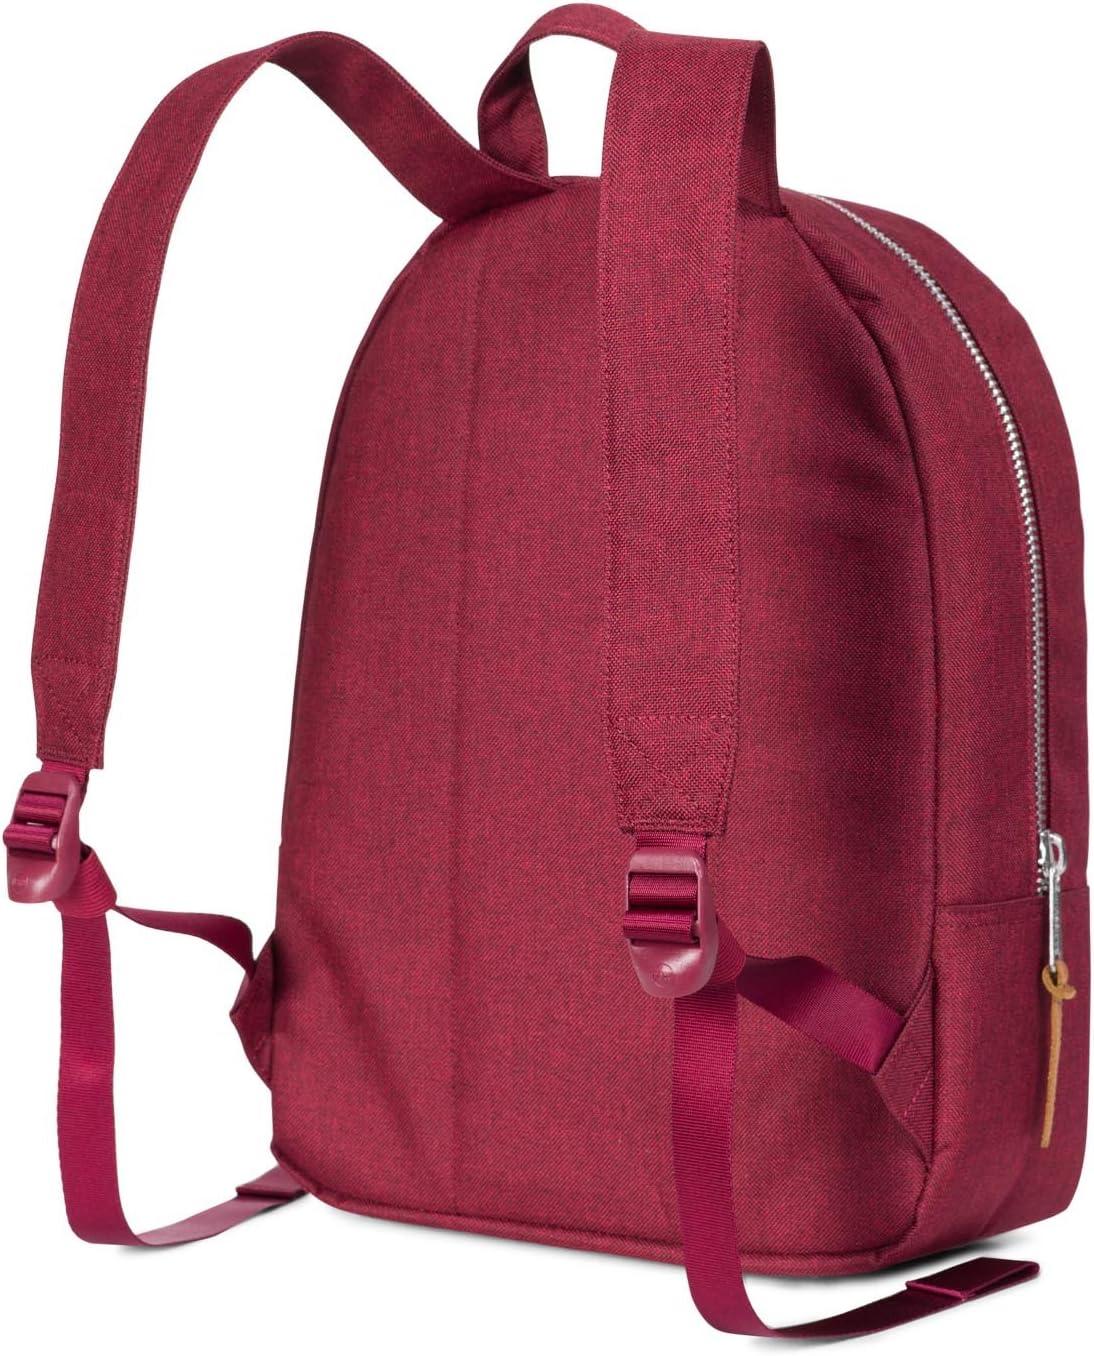 Herschel Grove Backpack zaino Rosa